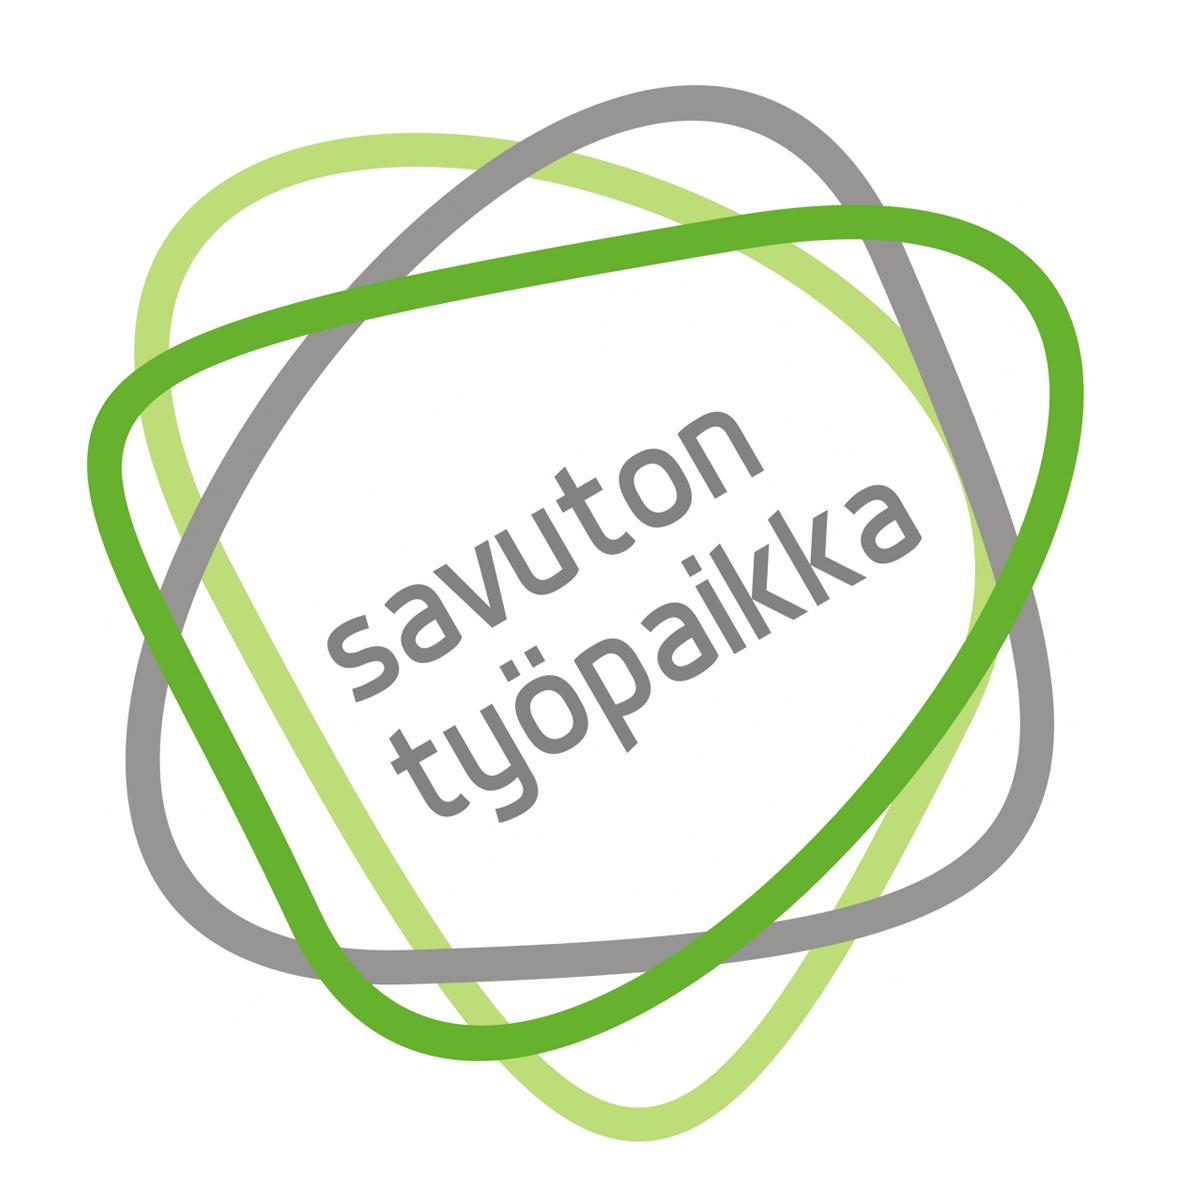 Rosvall Loviisa